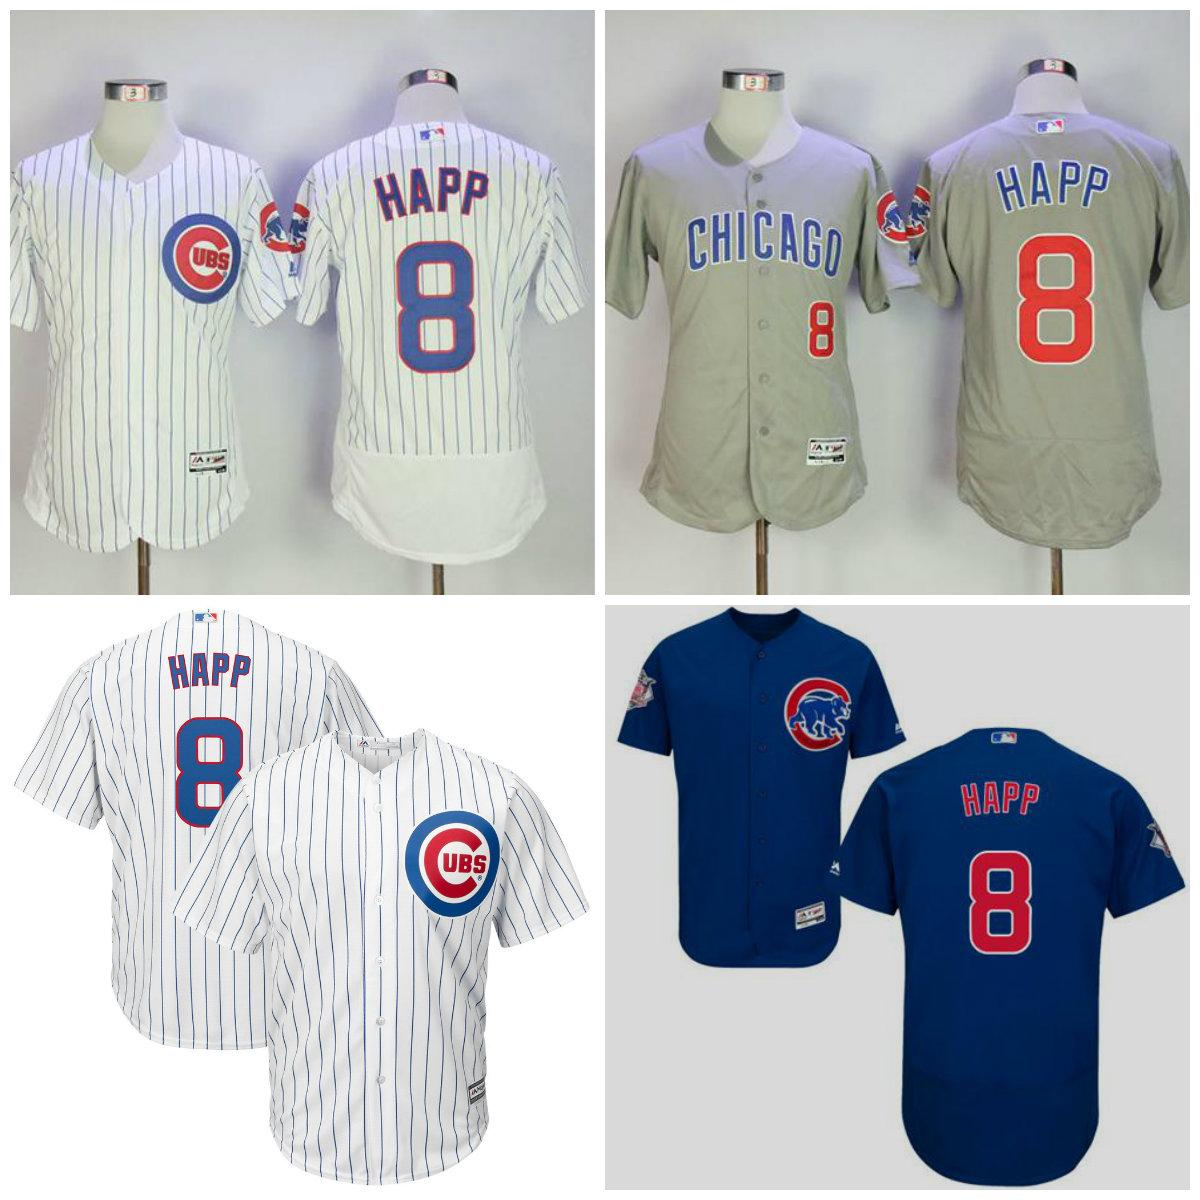 buy online b0594 b5daf 8 ian happ jersey